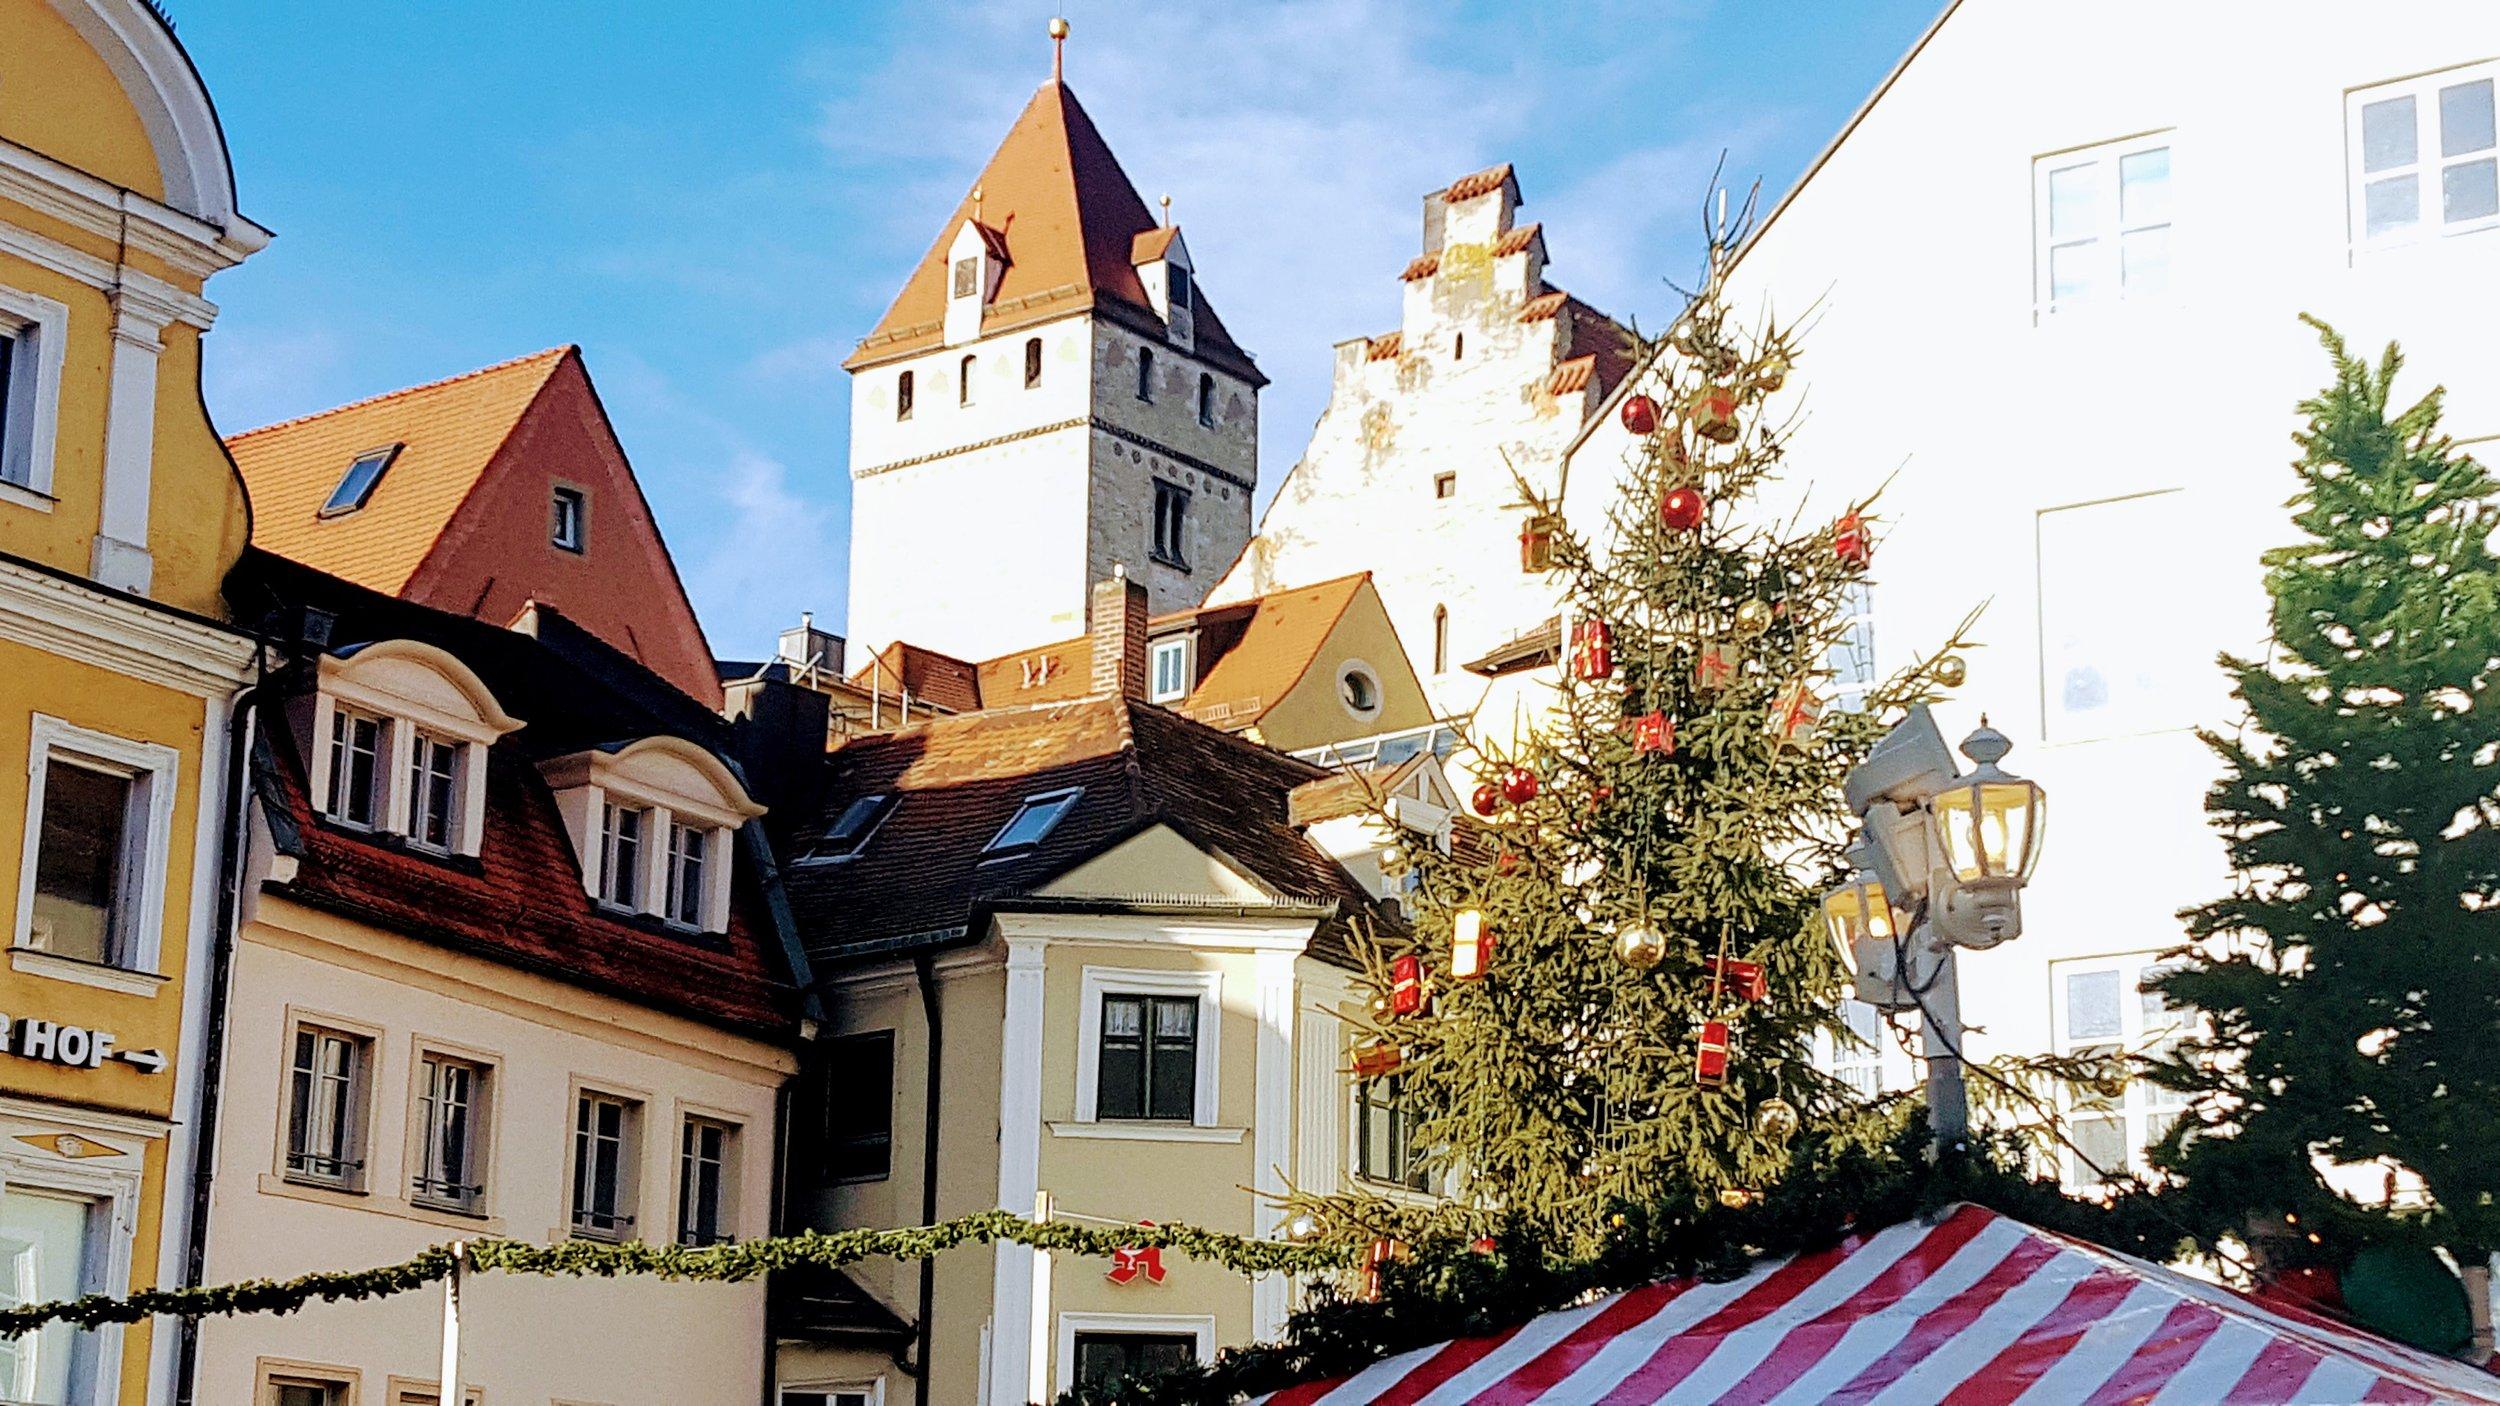 Regensburg Tower